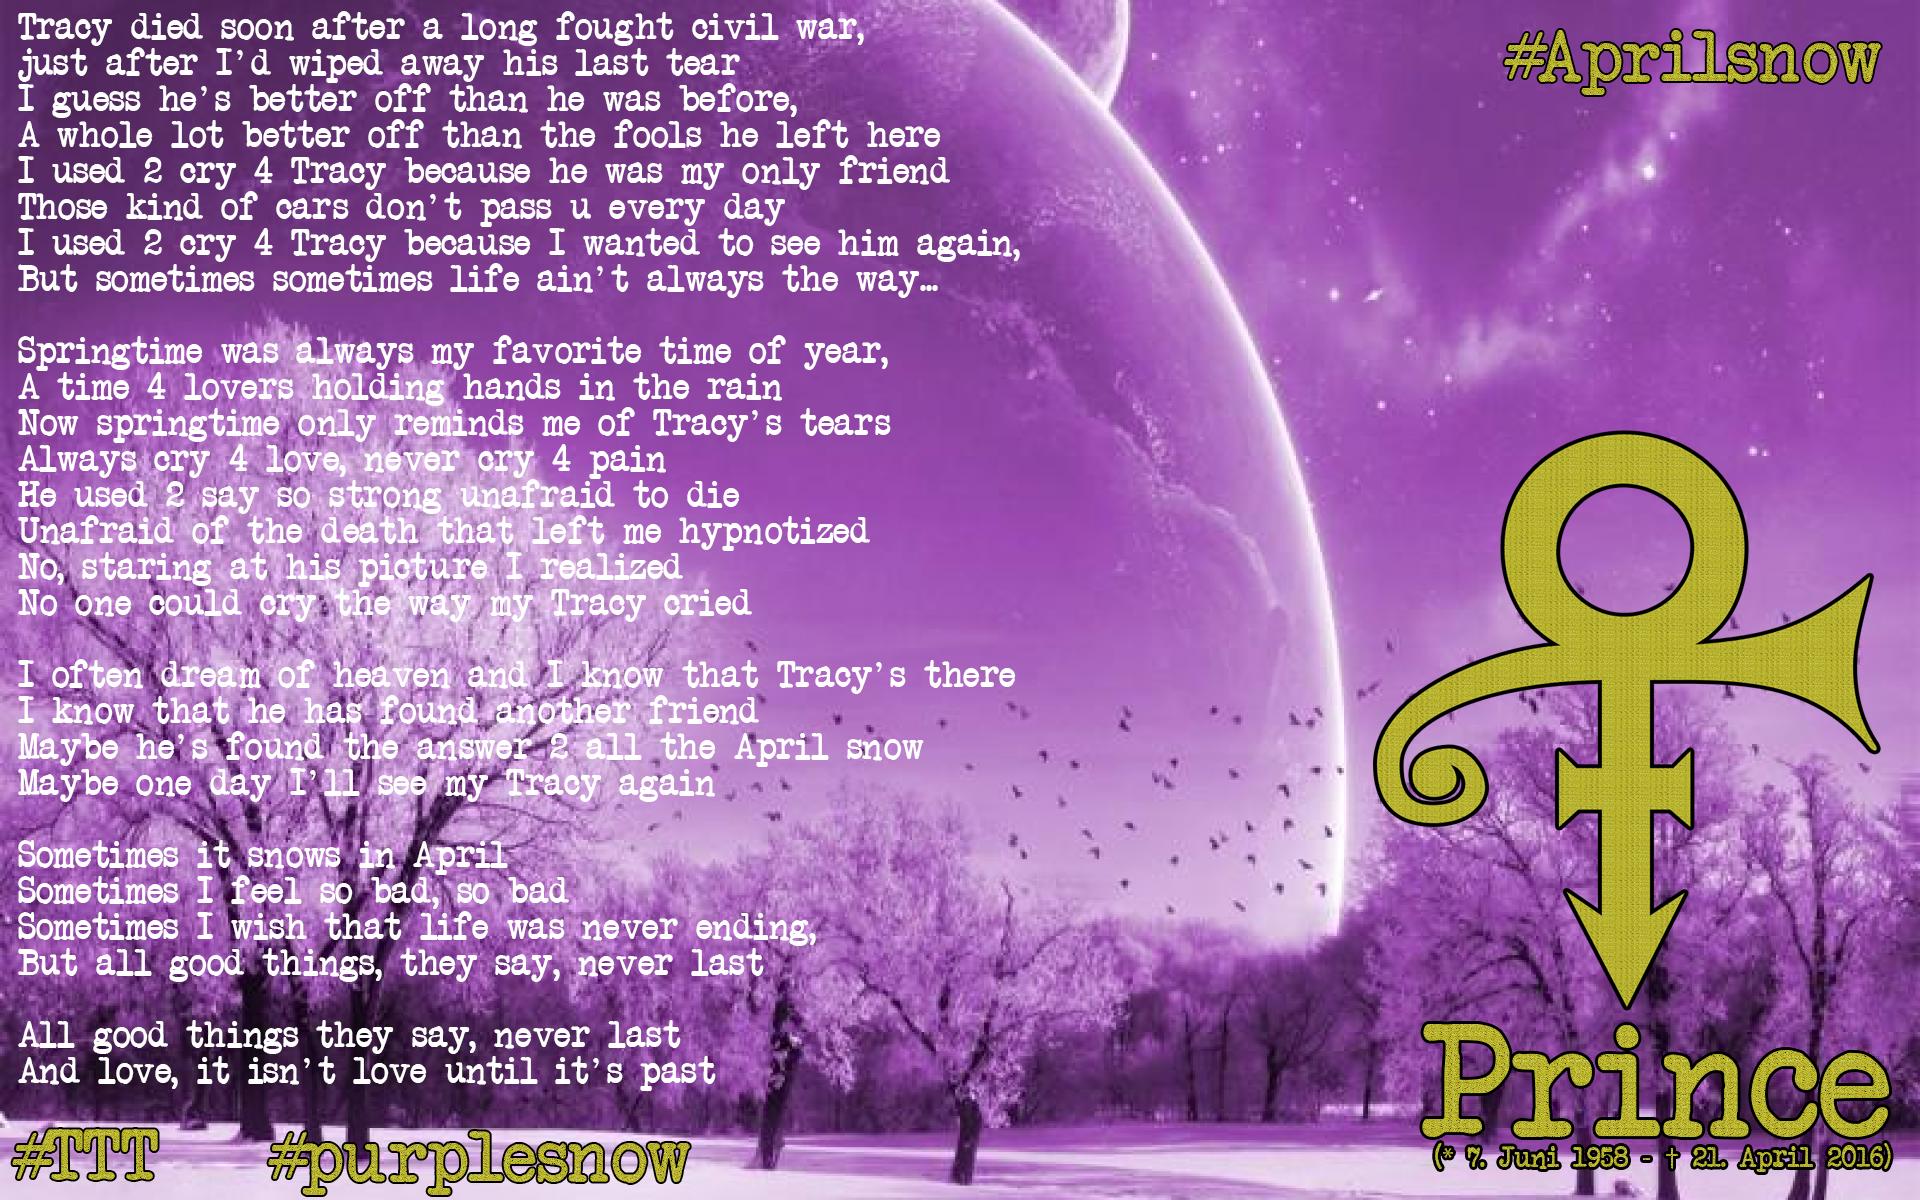 _Wallpaper_Prince_Purplesnow_1920Px